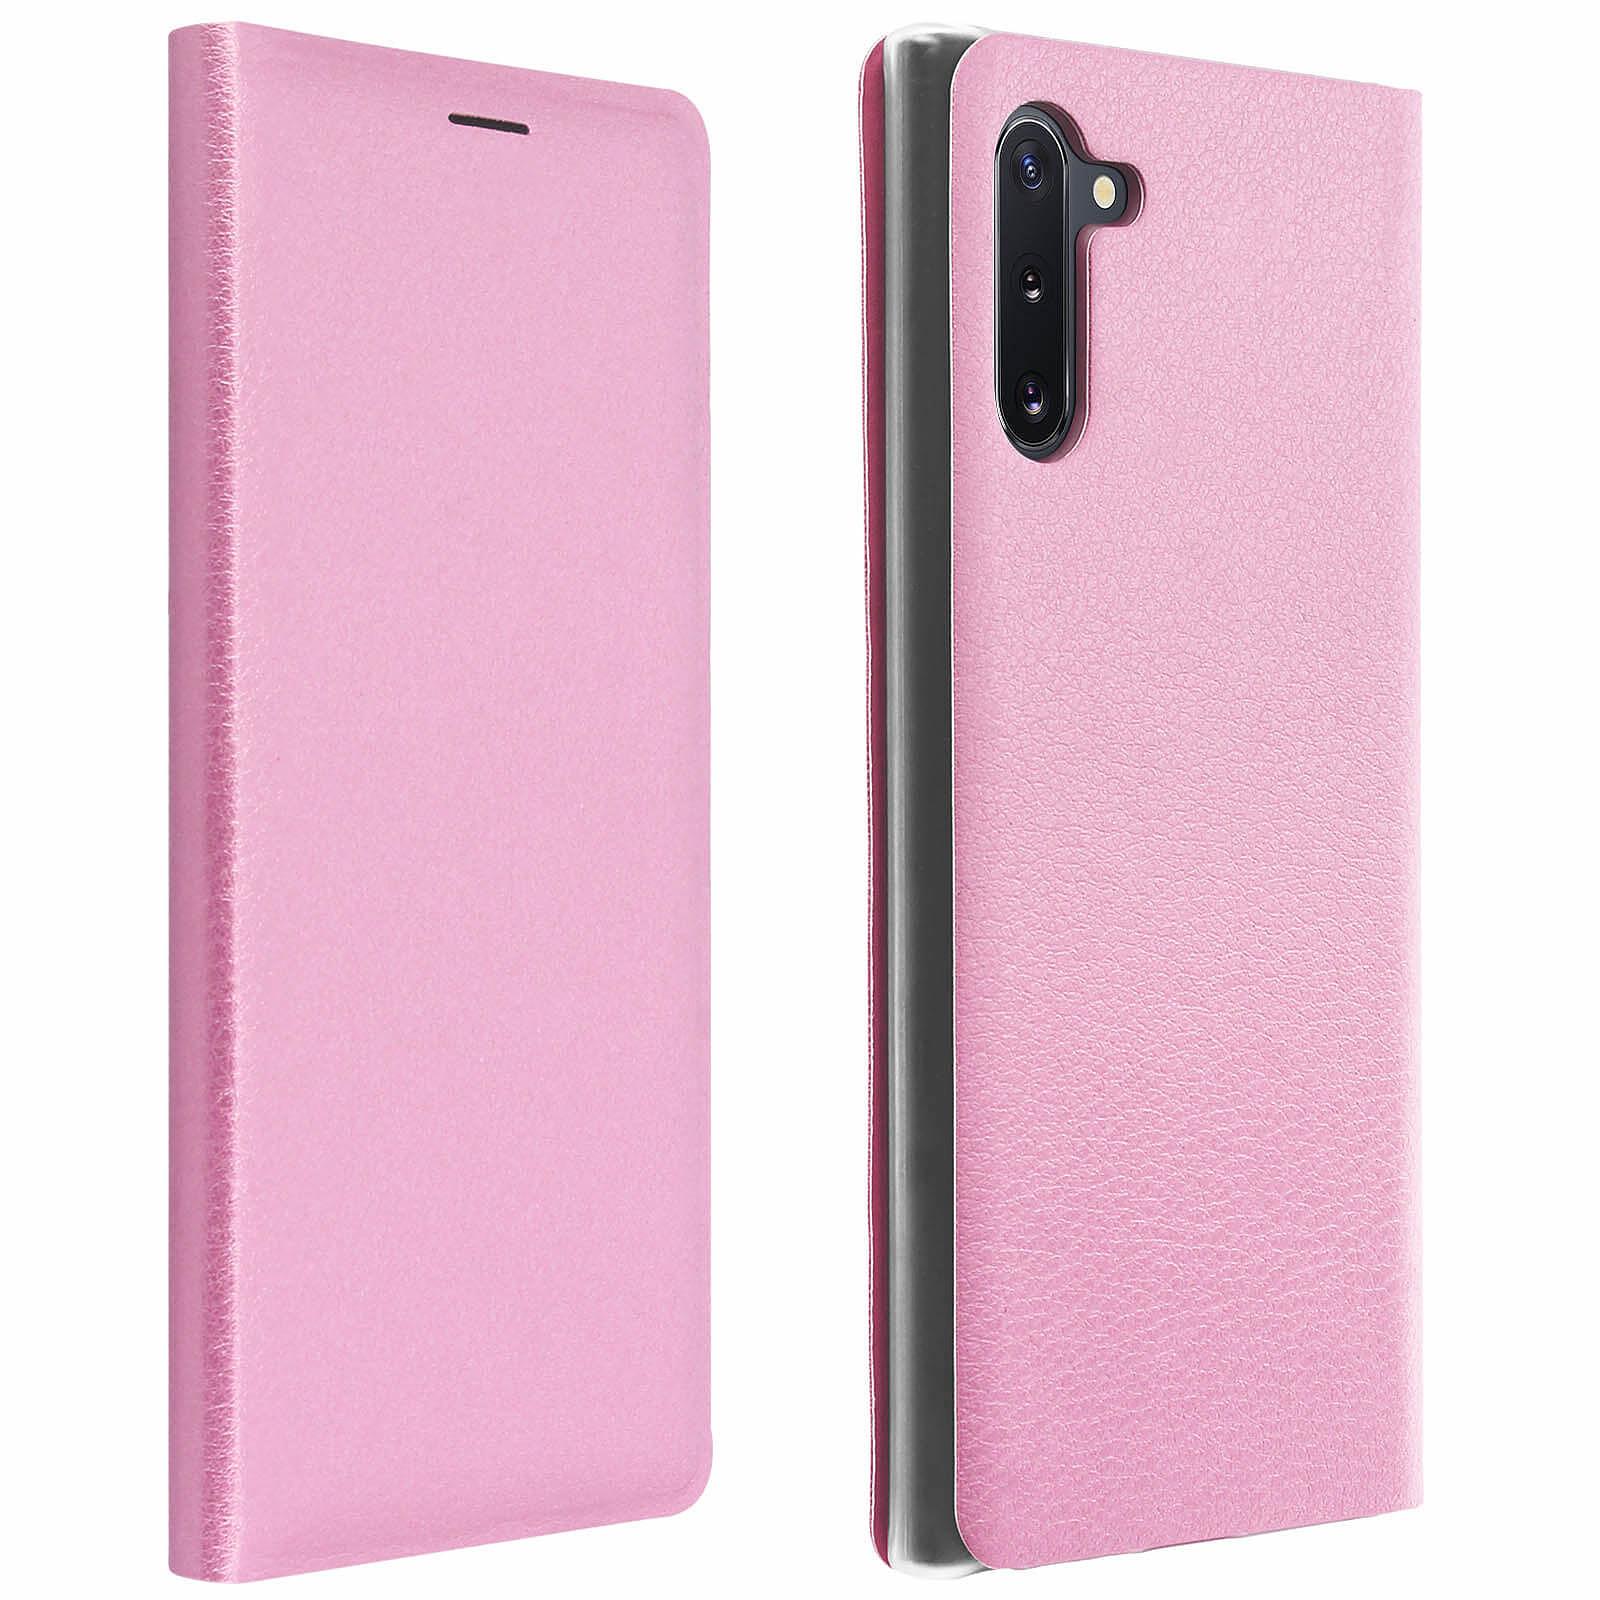 Avizar Etui folio Rose Portefeuille pour Samsung Galaxy Note 10